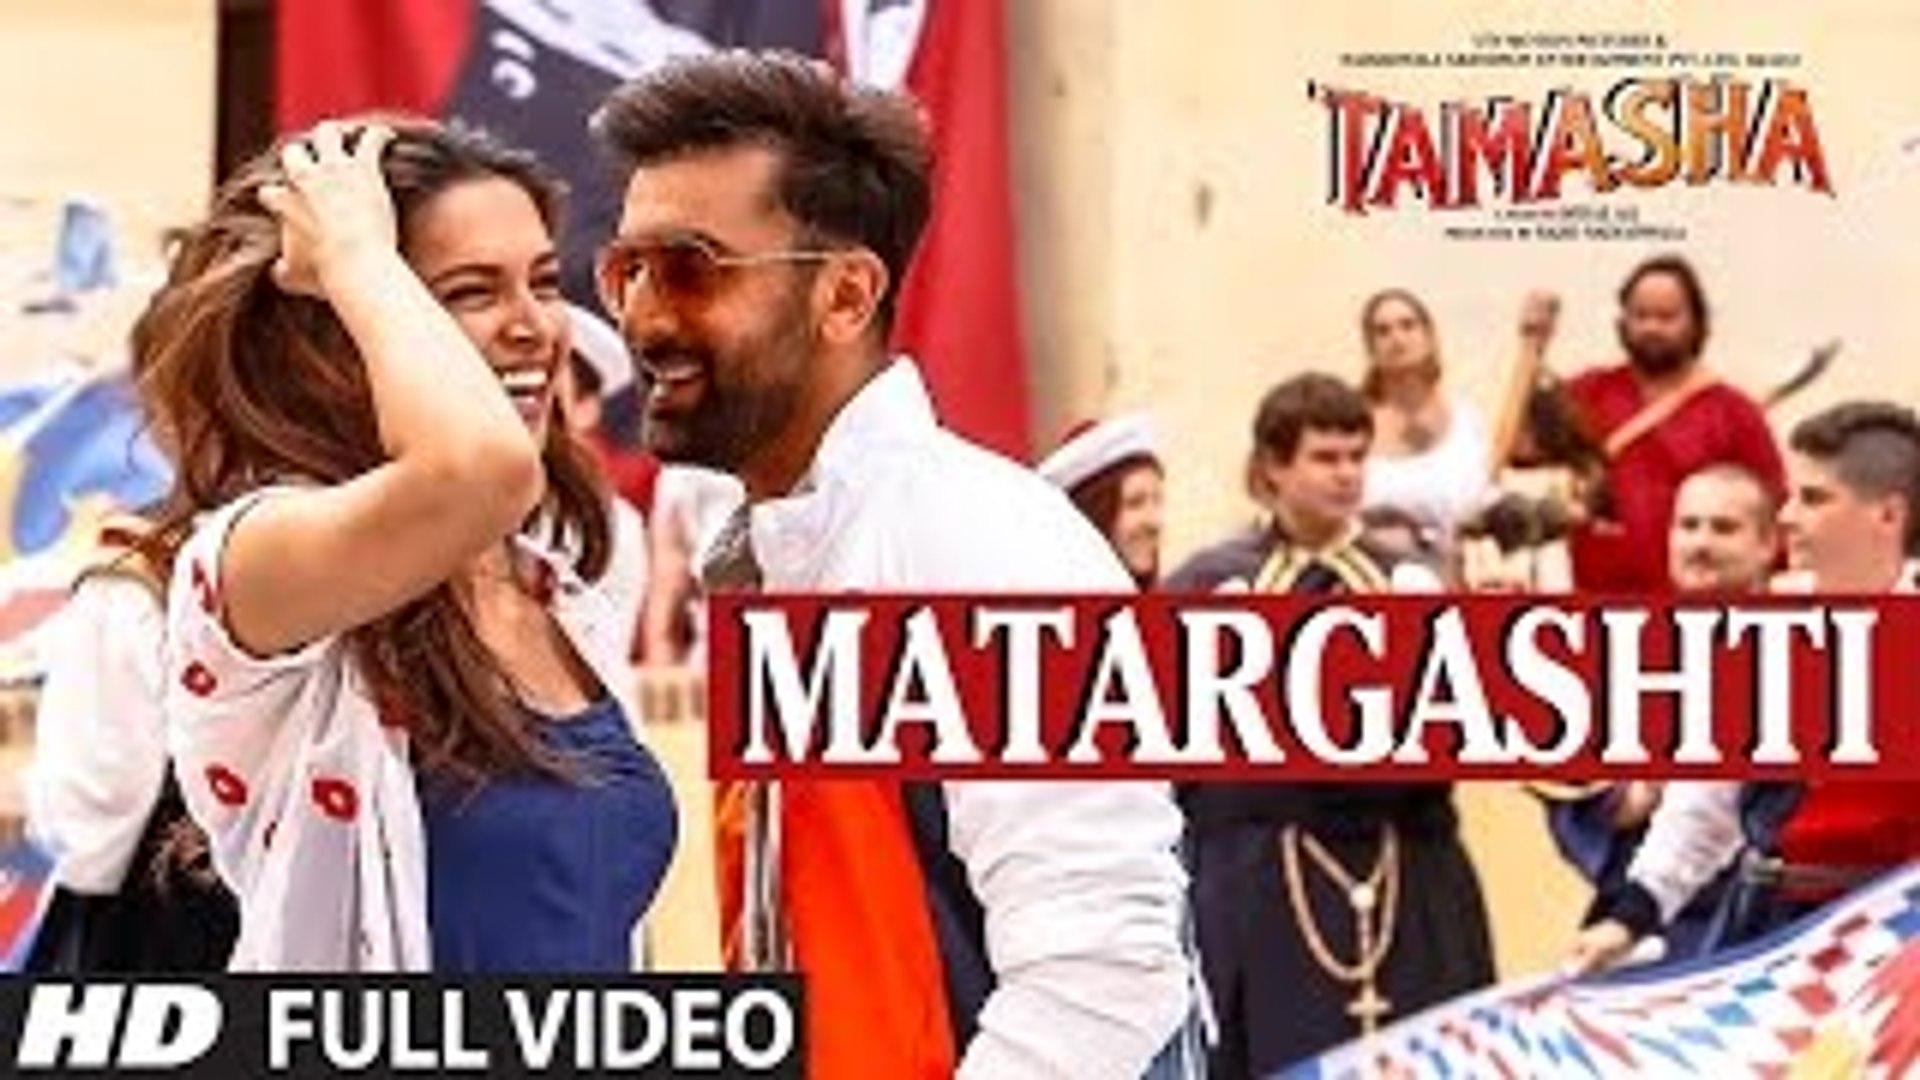 MATARGASHTI full VIDEO Song | TAMASHA Songs 2015 | Ranbir Kapoor, Deepika Padukone